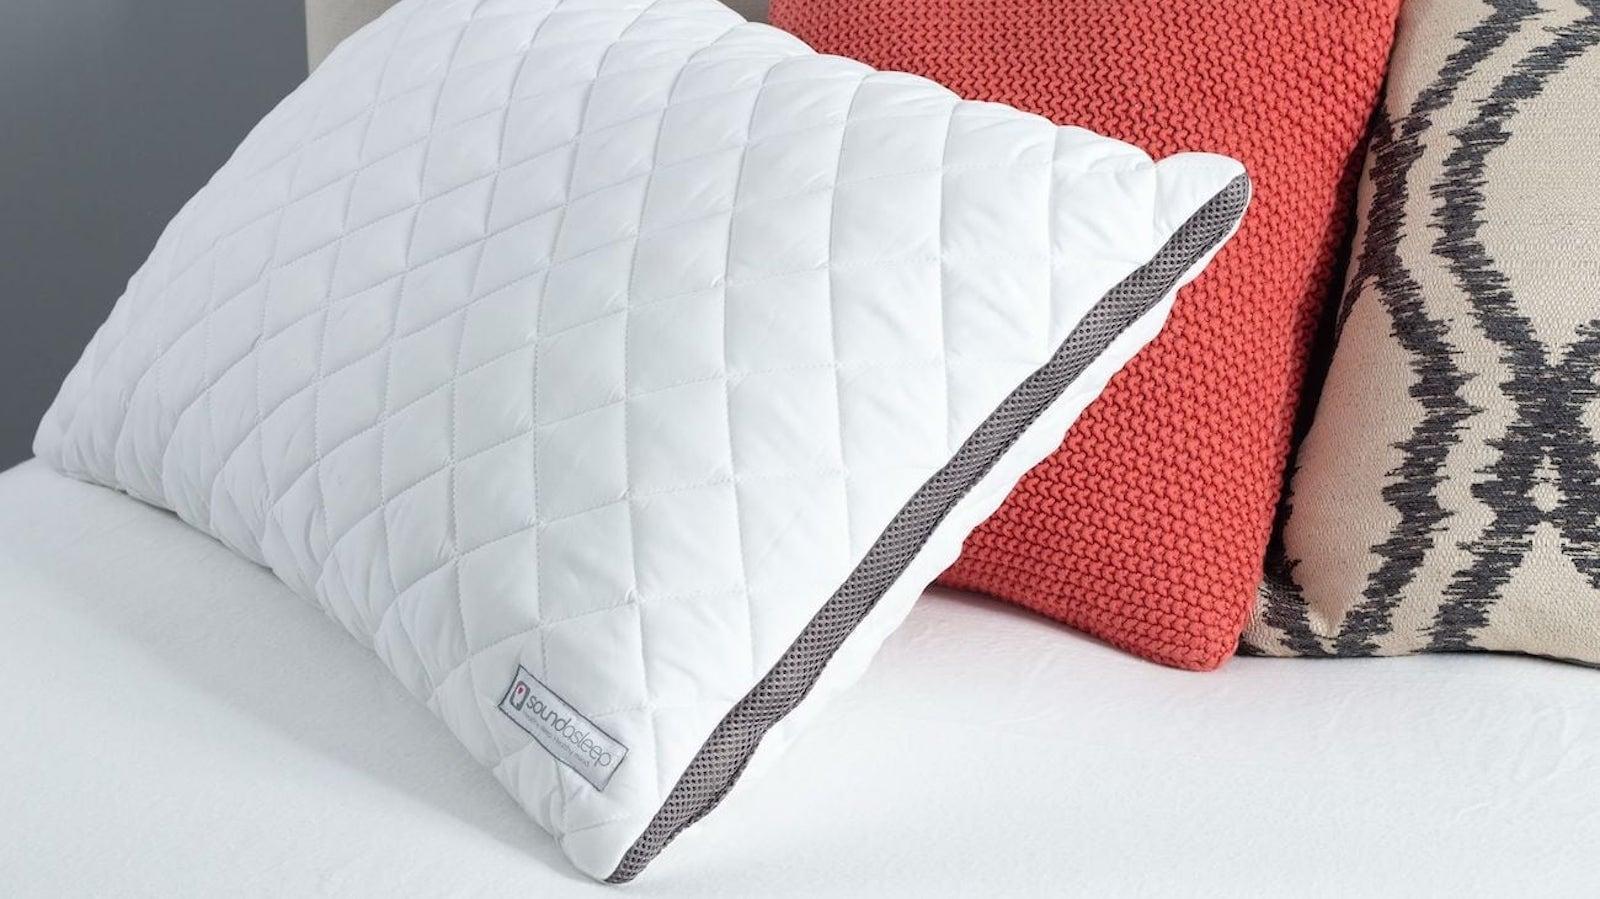 soundasleep bluetooth speaker pillow monitors your sleeping patterns